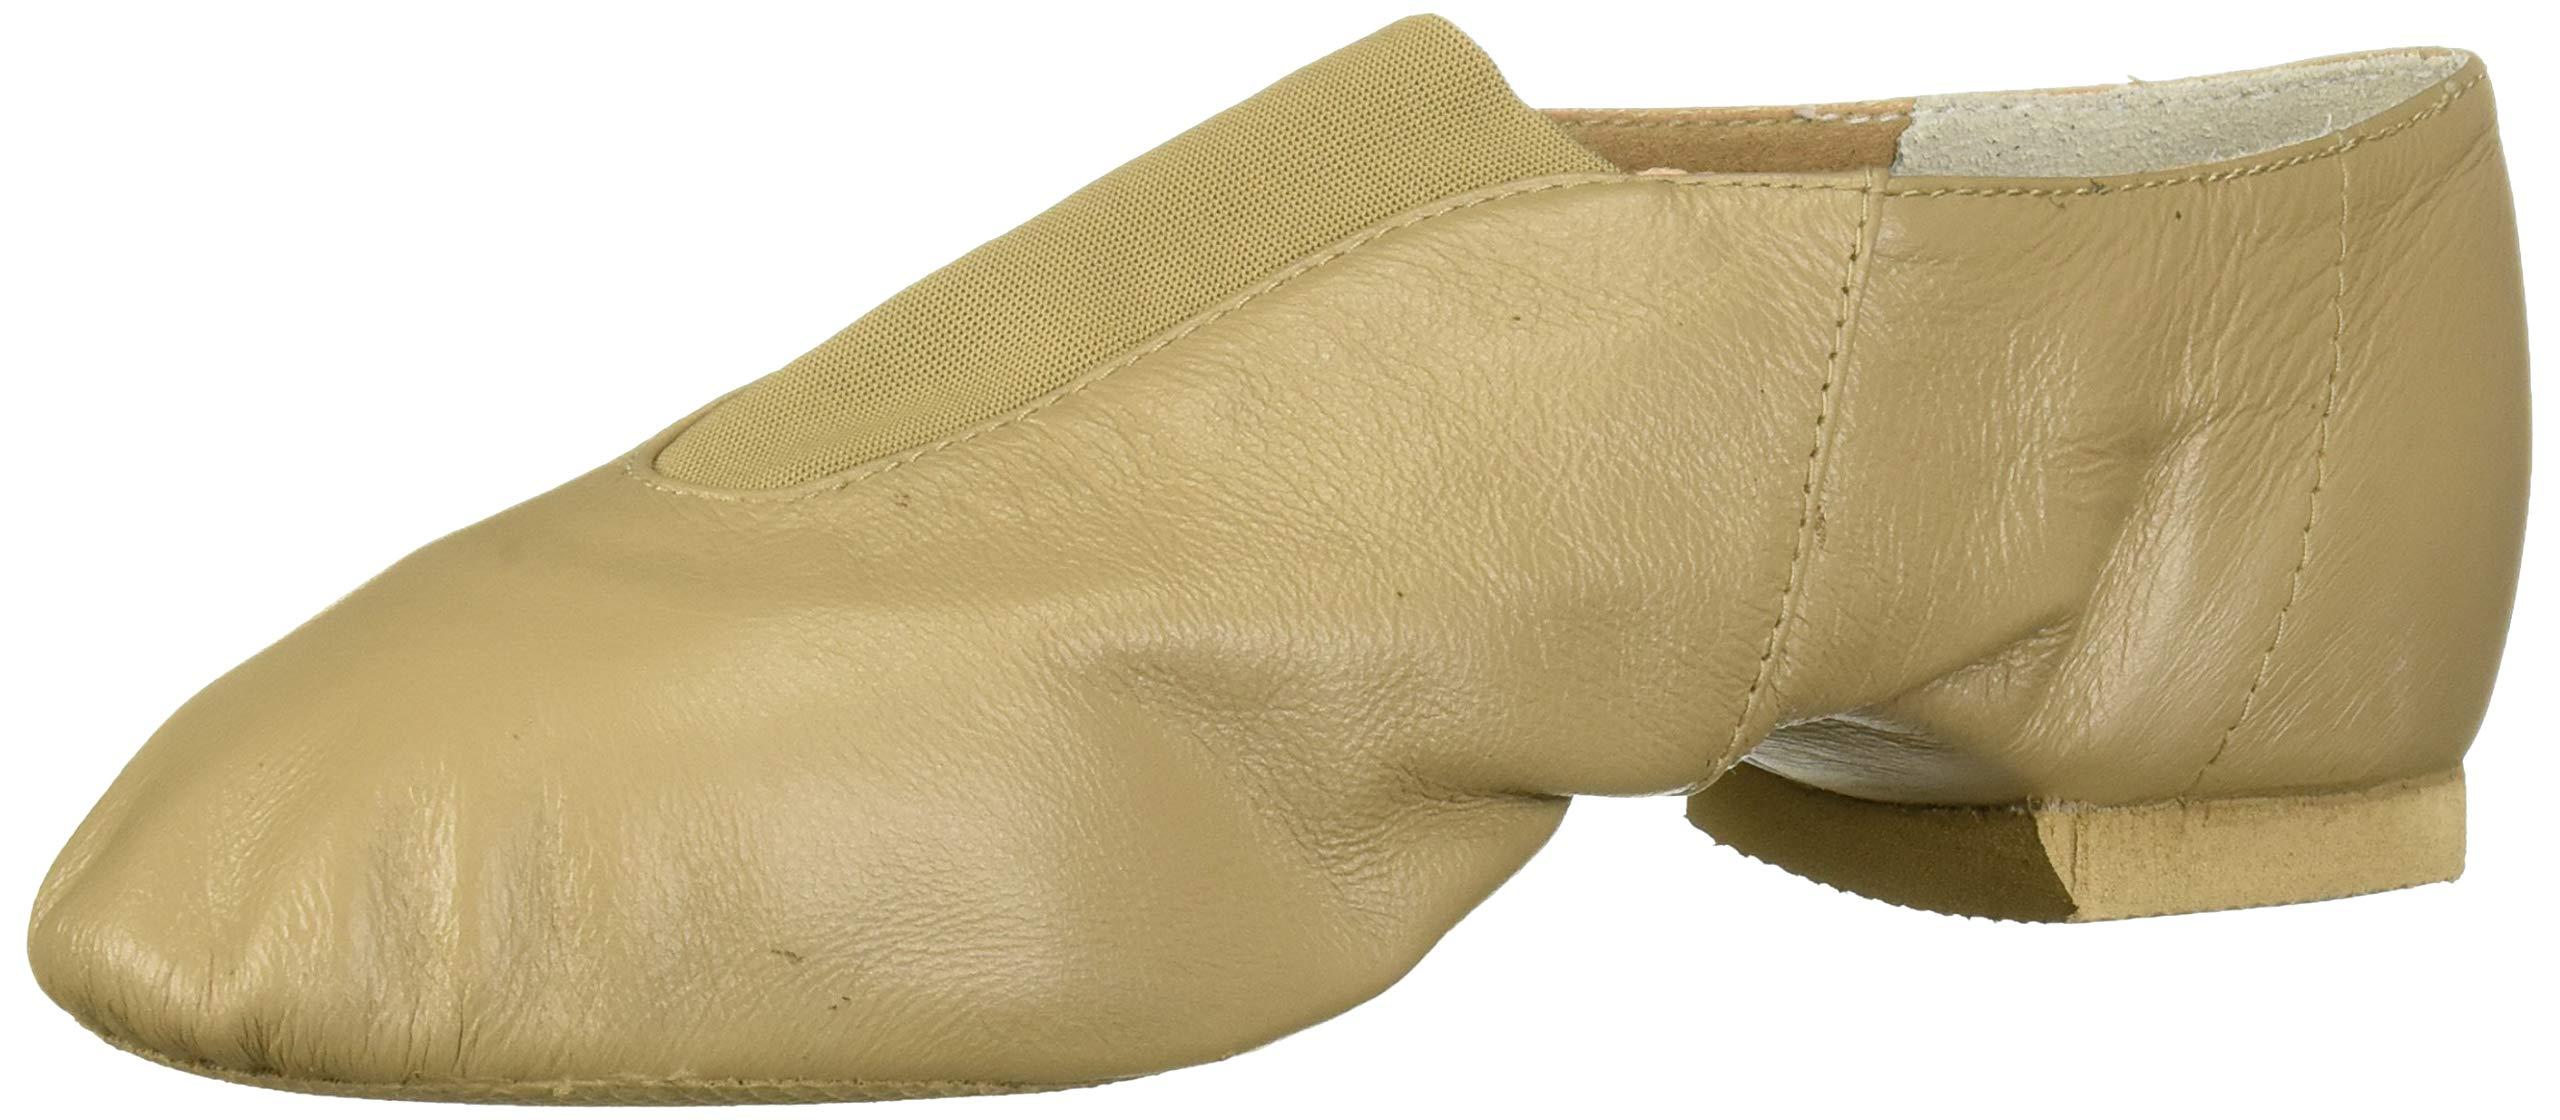 Bloch Women's Super Jazz Shoe,Taupe,5.5 M US by Bloch